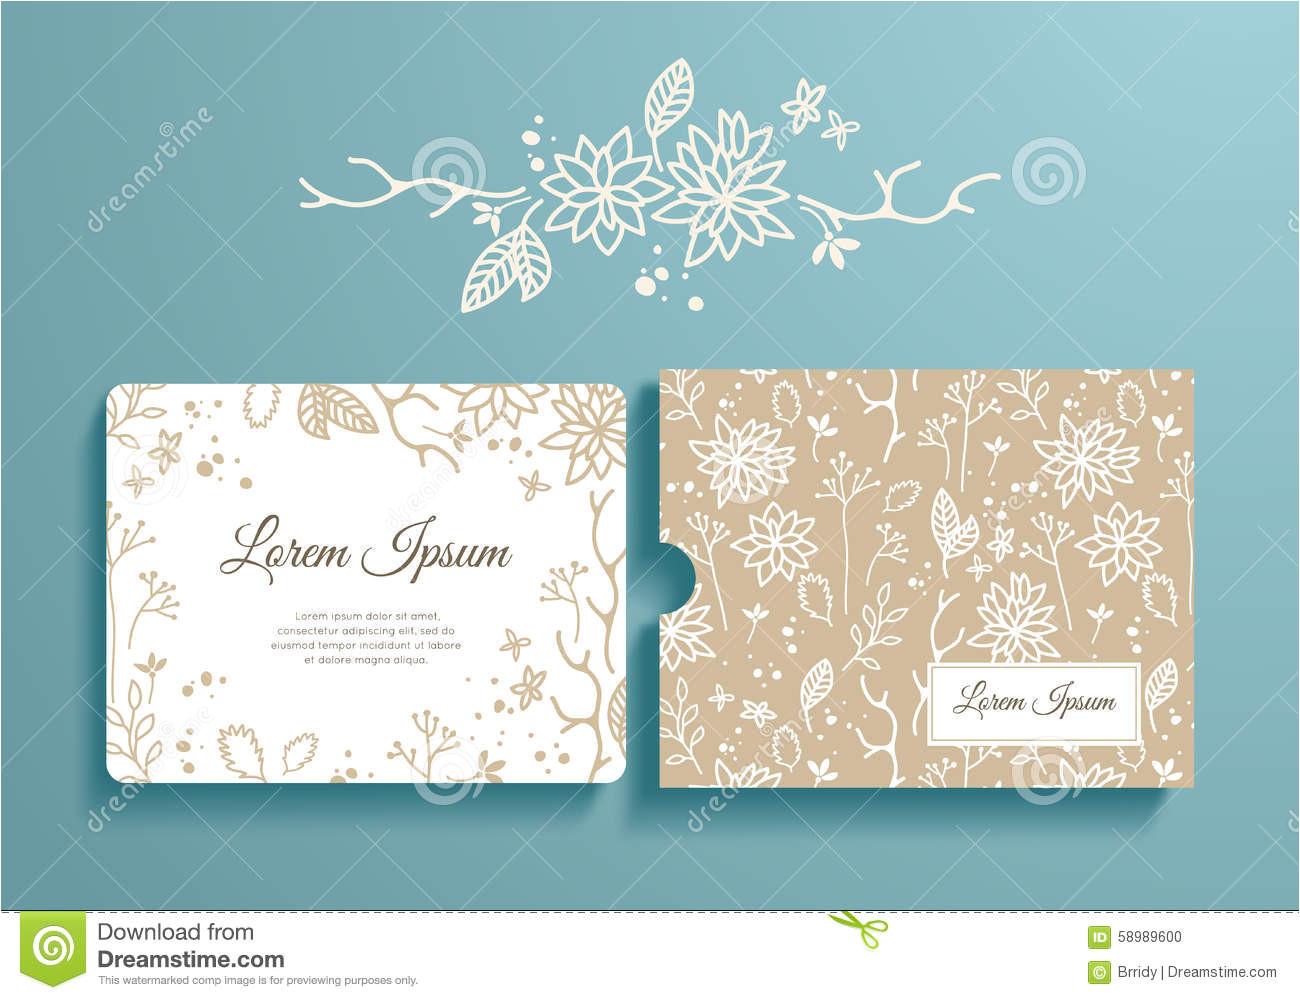 stock illustration floral set romantic invitation envelope template card wedding marriage bridal birthday valentine s day image58989600